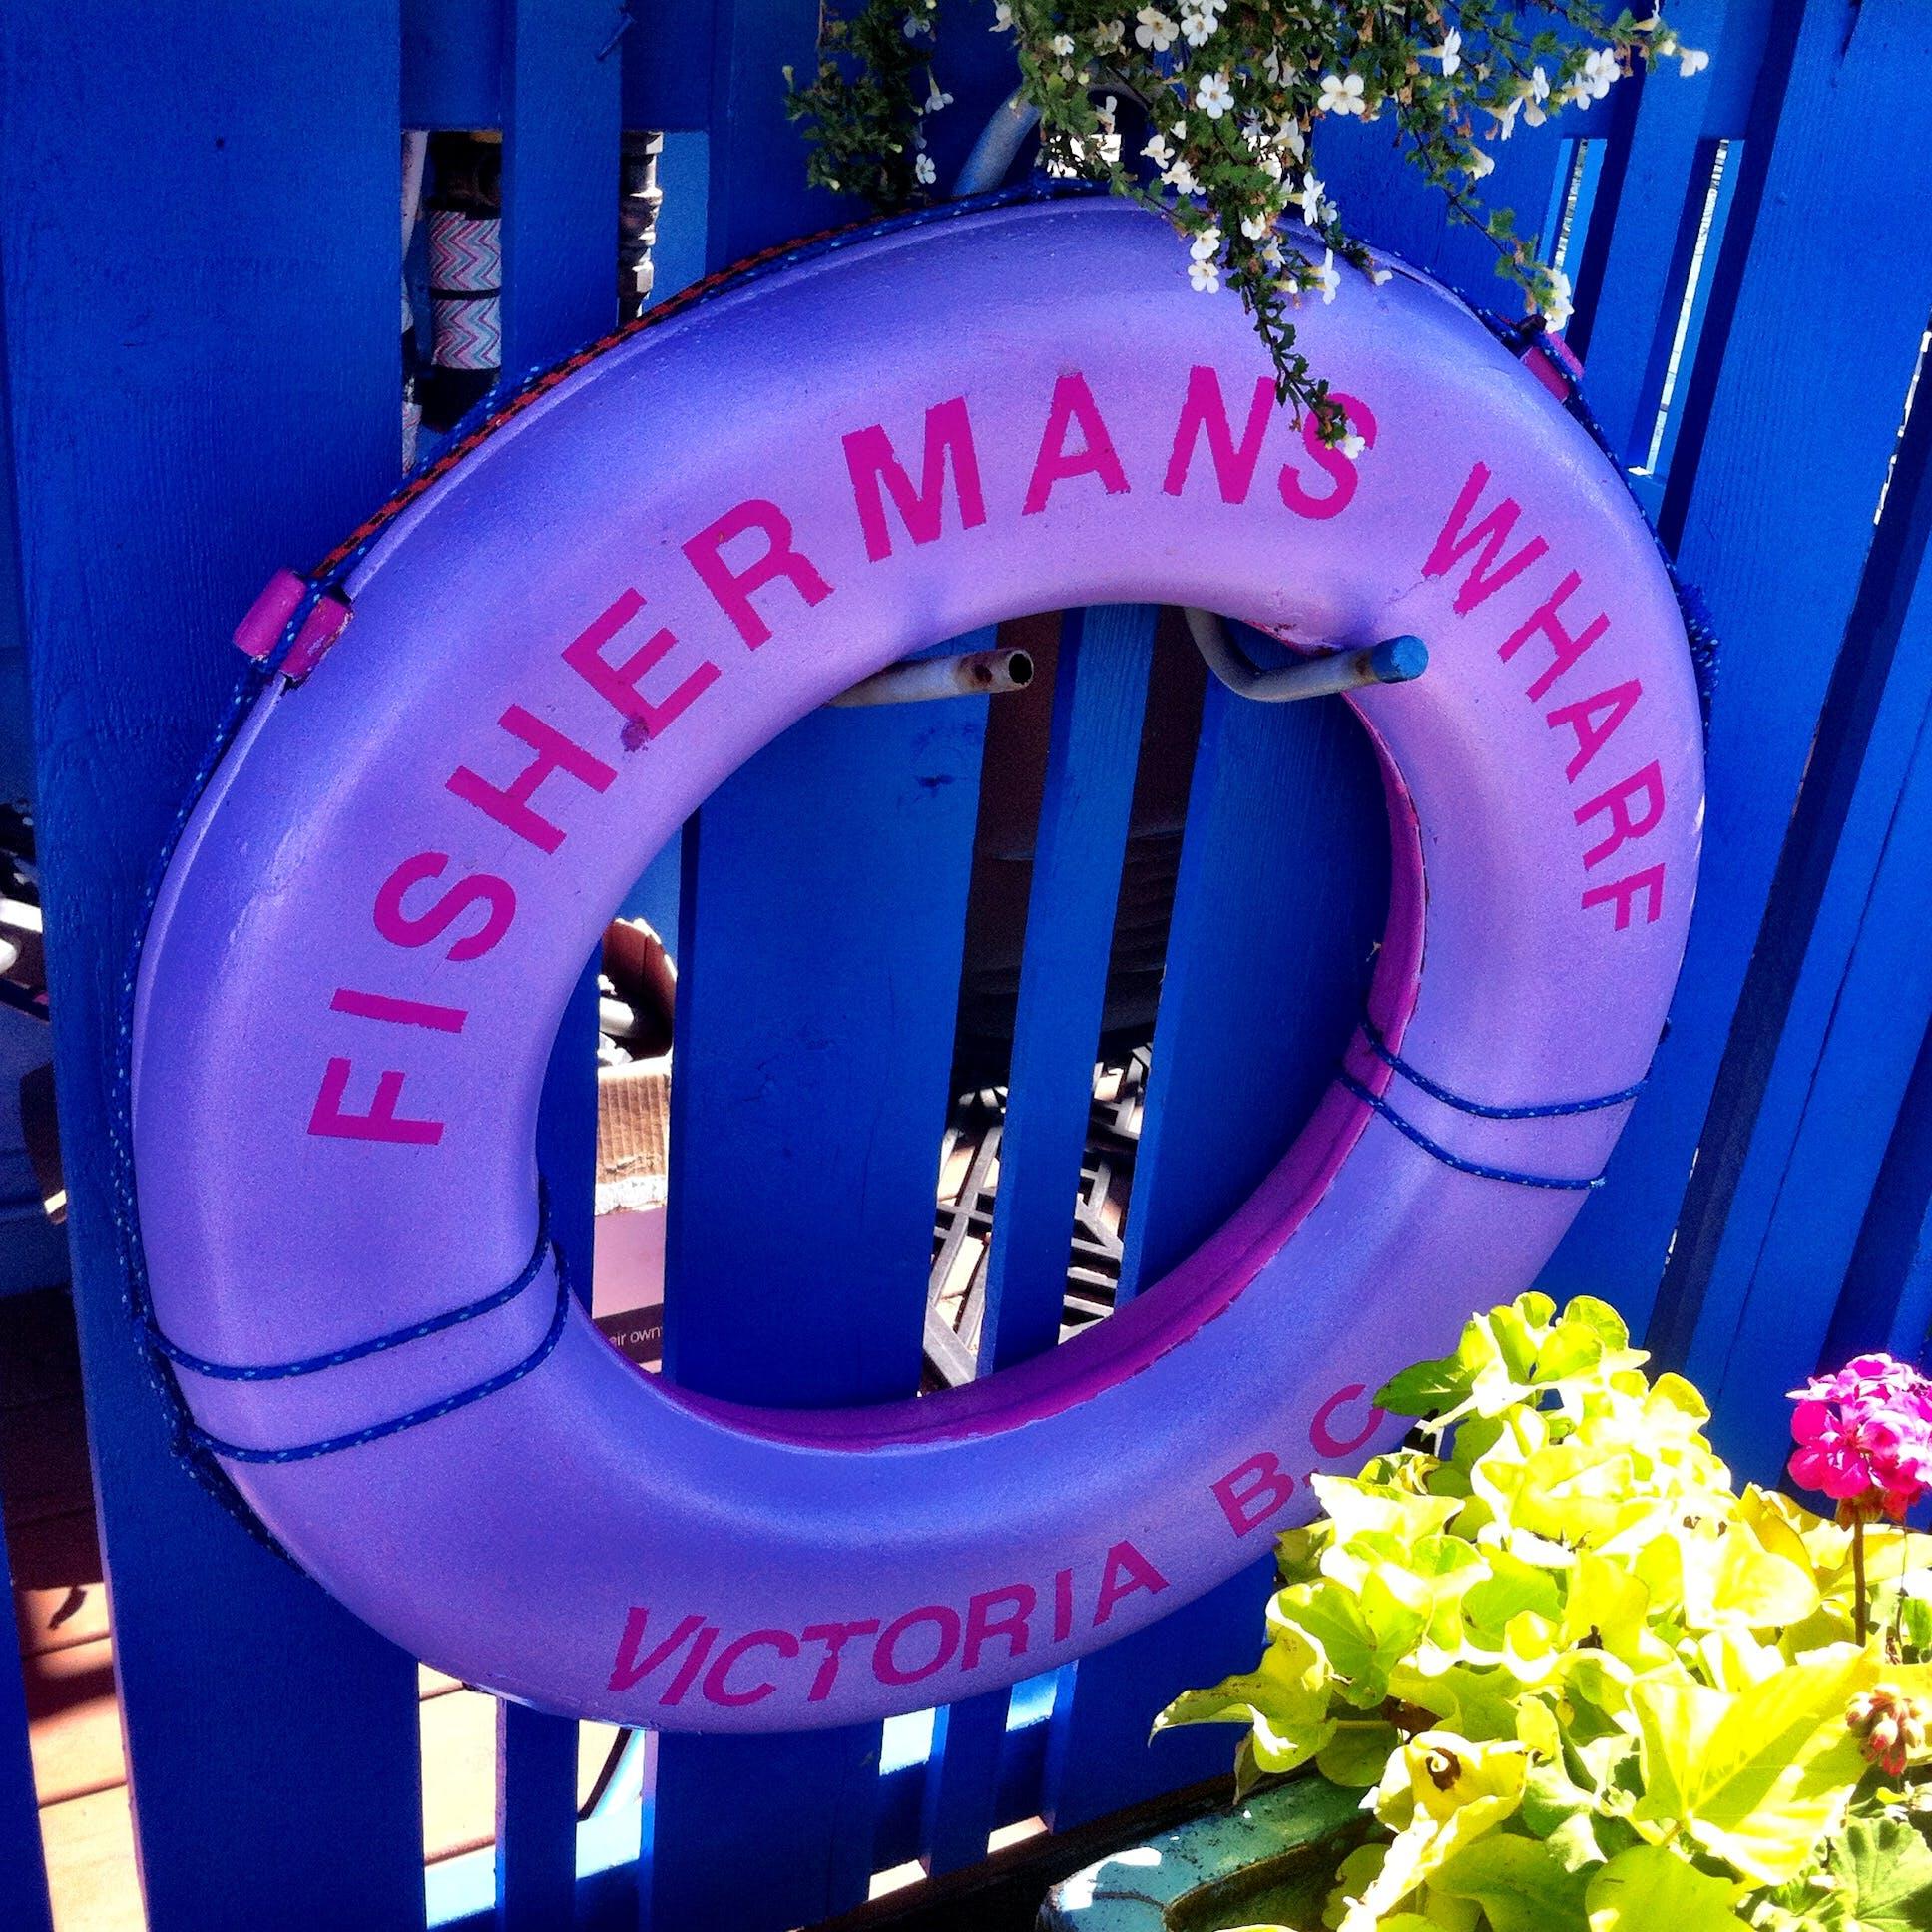 Free stock photo of Fisherman's warf